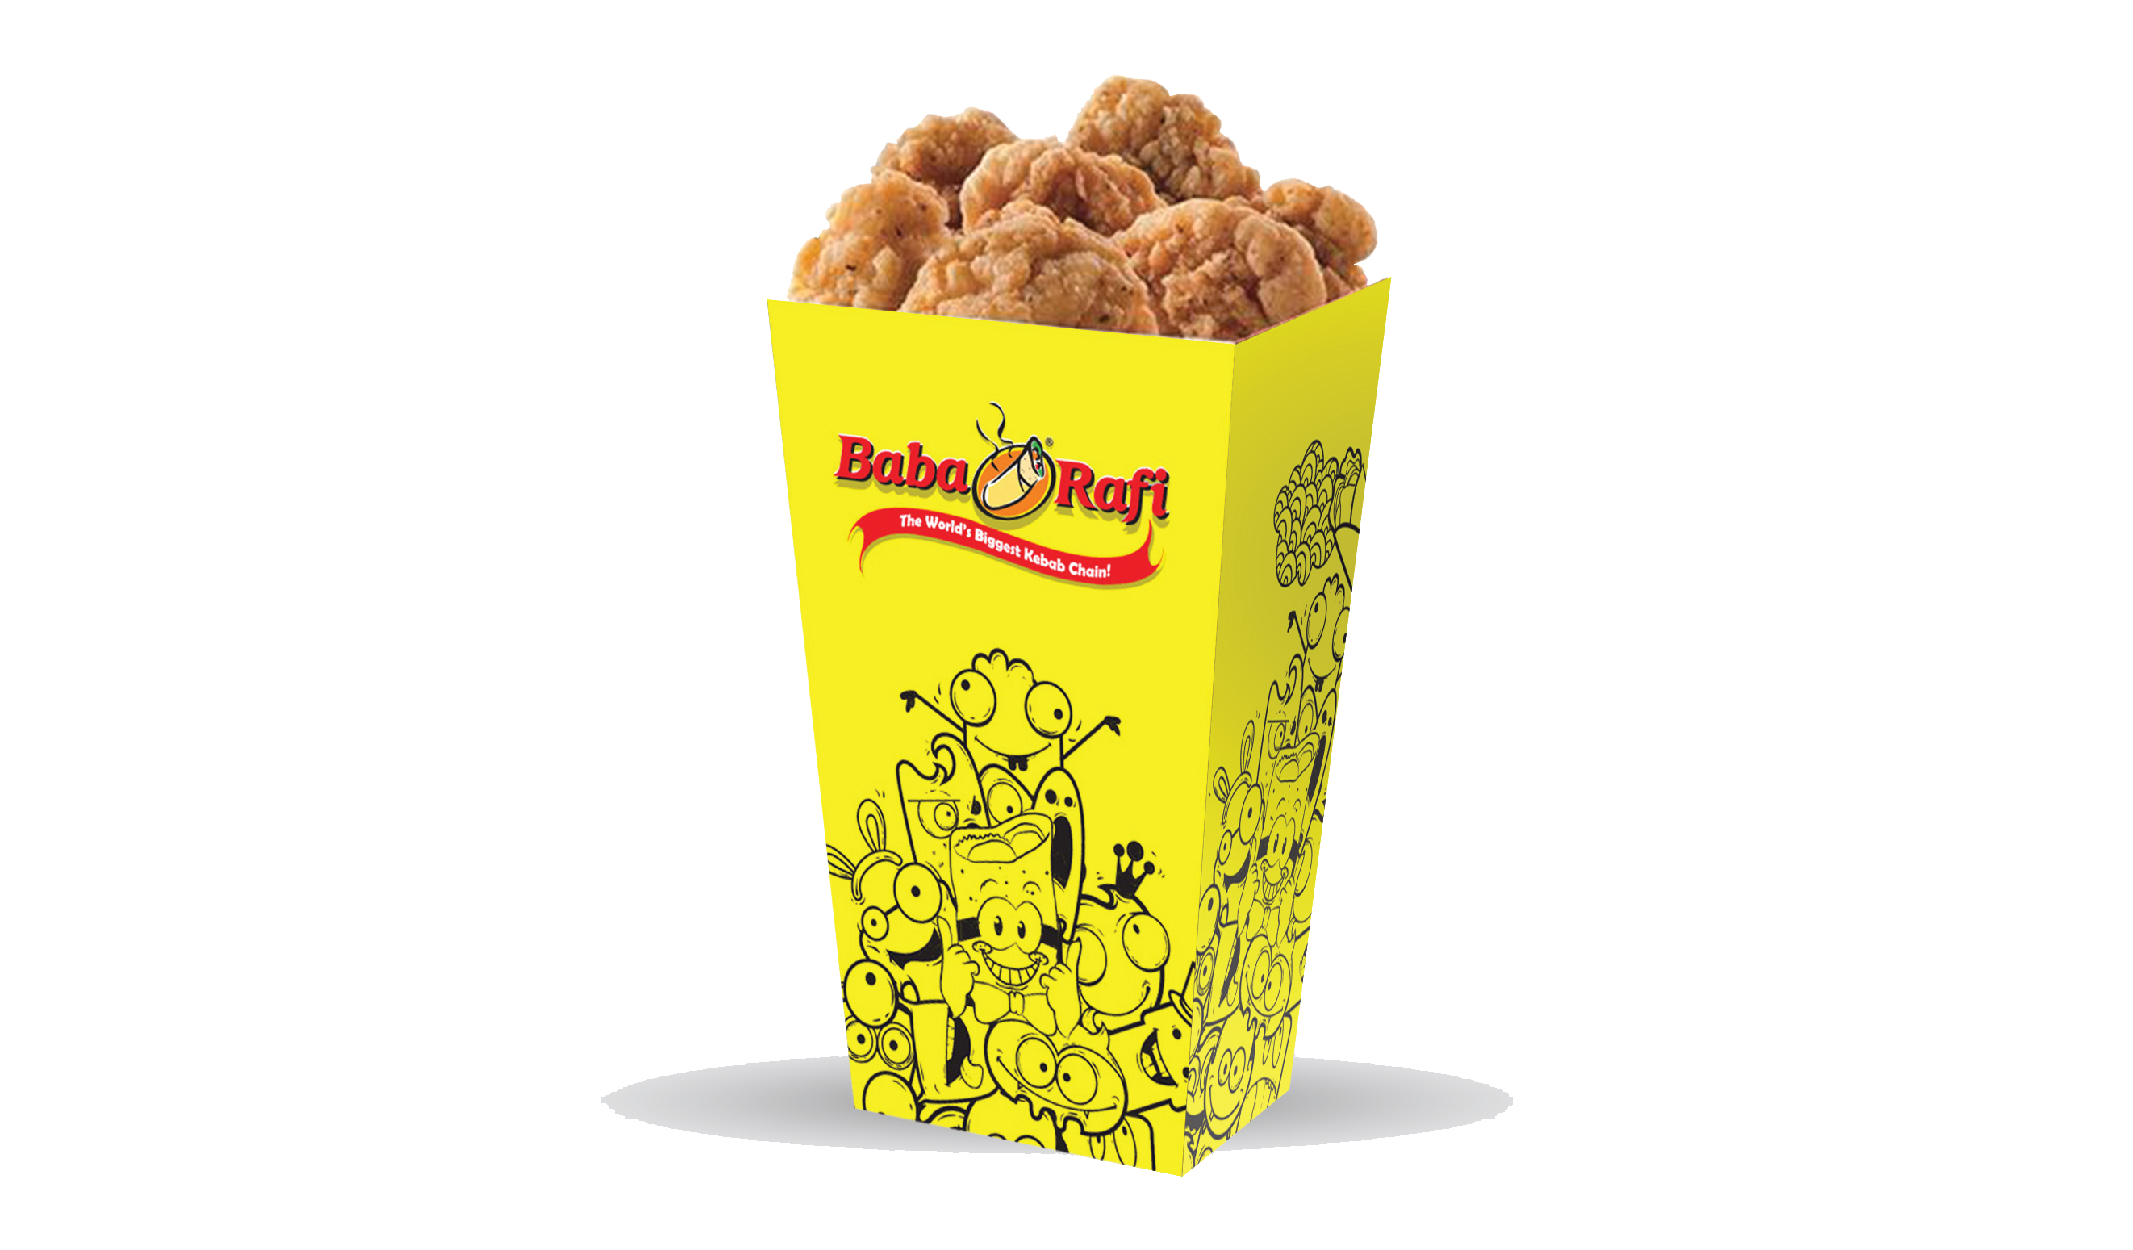 Baba Rafi Frozen Kebab Chicken Harga Terkini Dan Terlengkap Swekiau Babarafi Popcorn